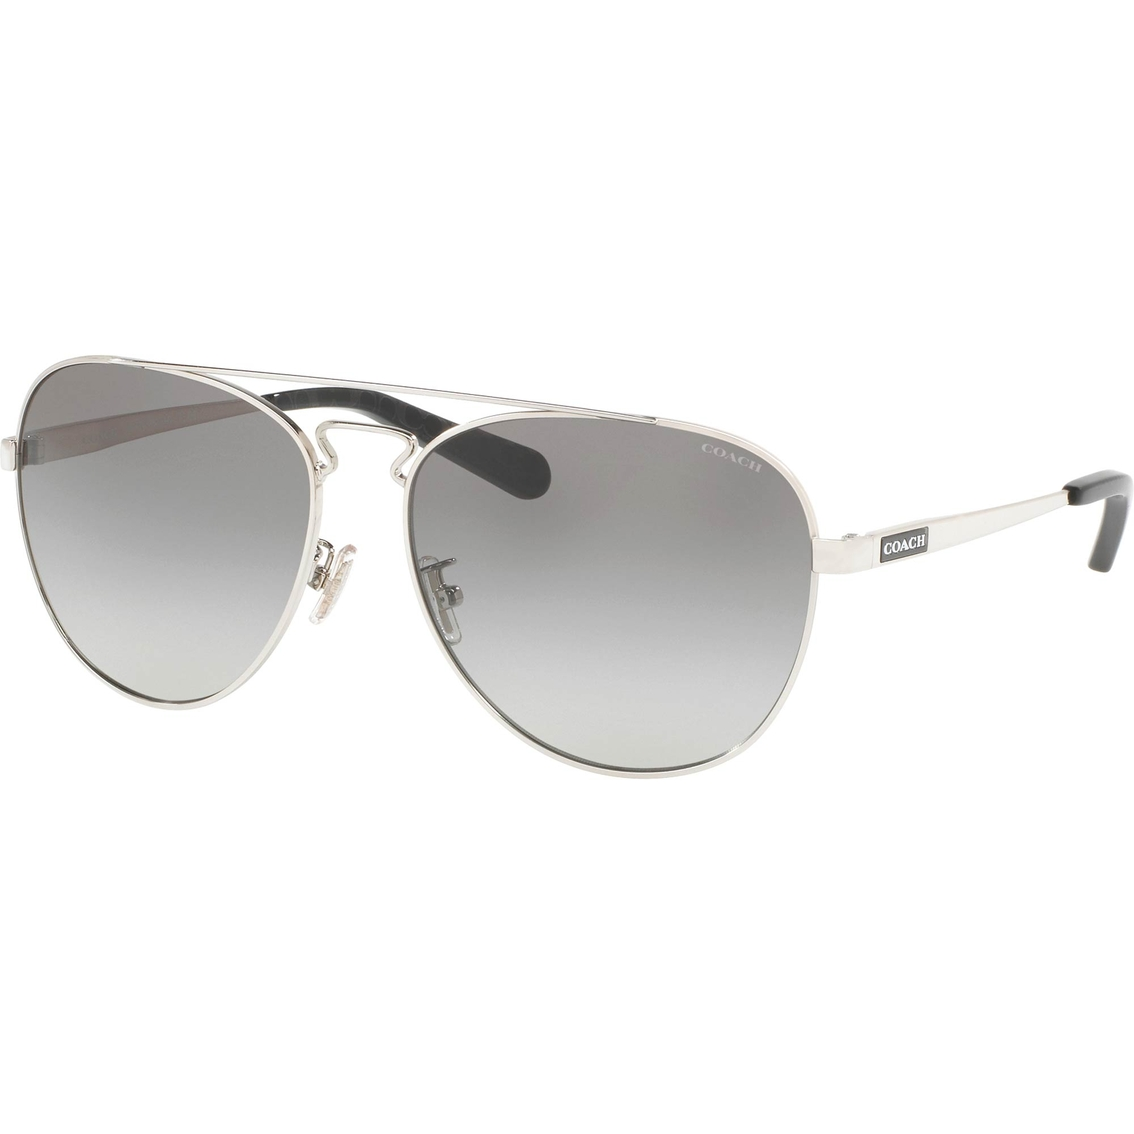 187c015cc62b Coach Sunglasses 0hc7069 | Women's Sunglasses | Handbags ...